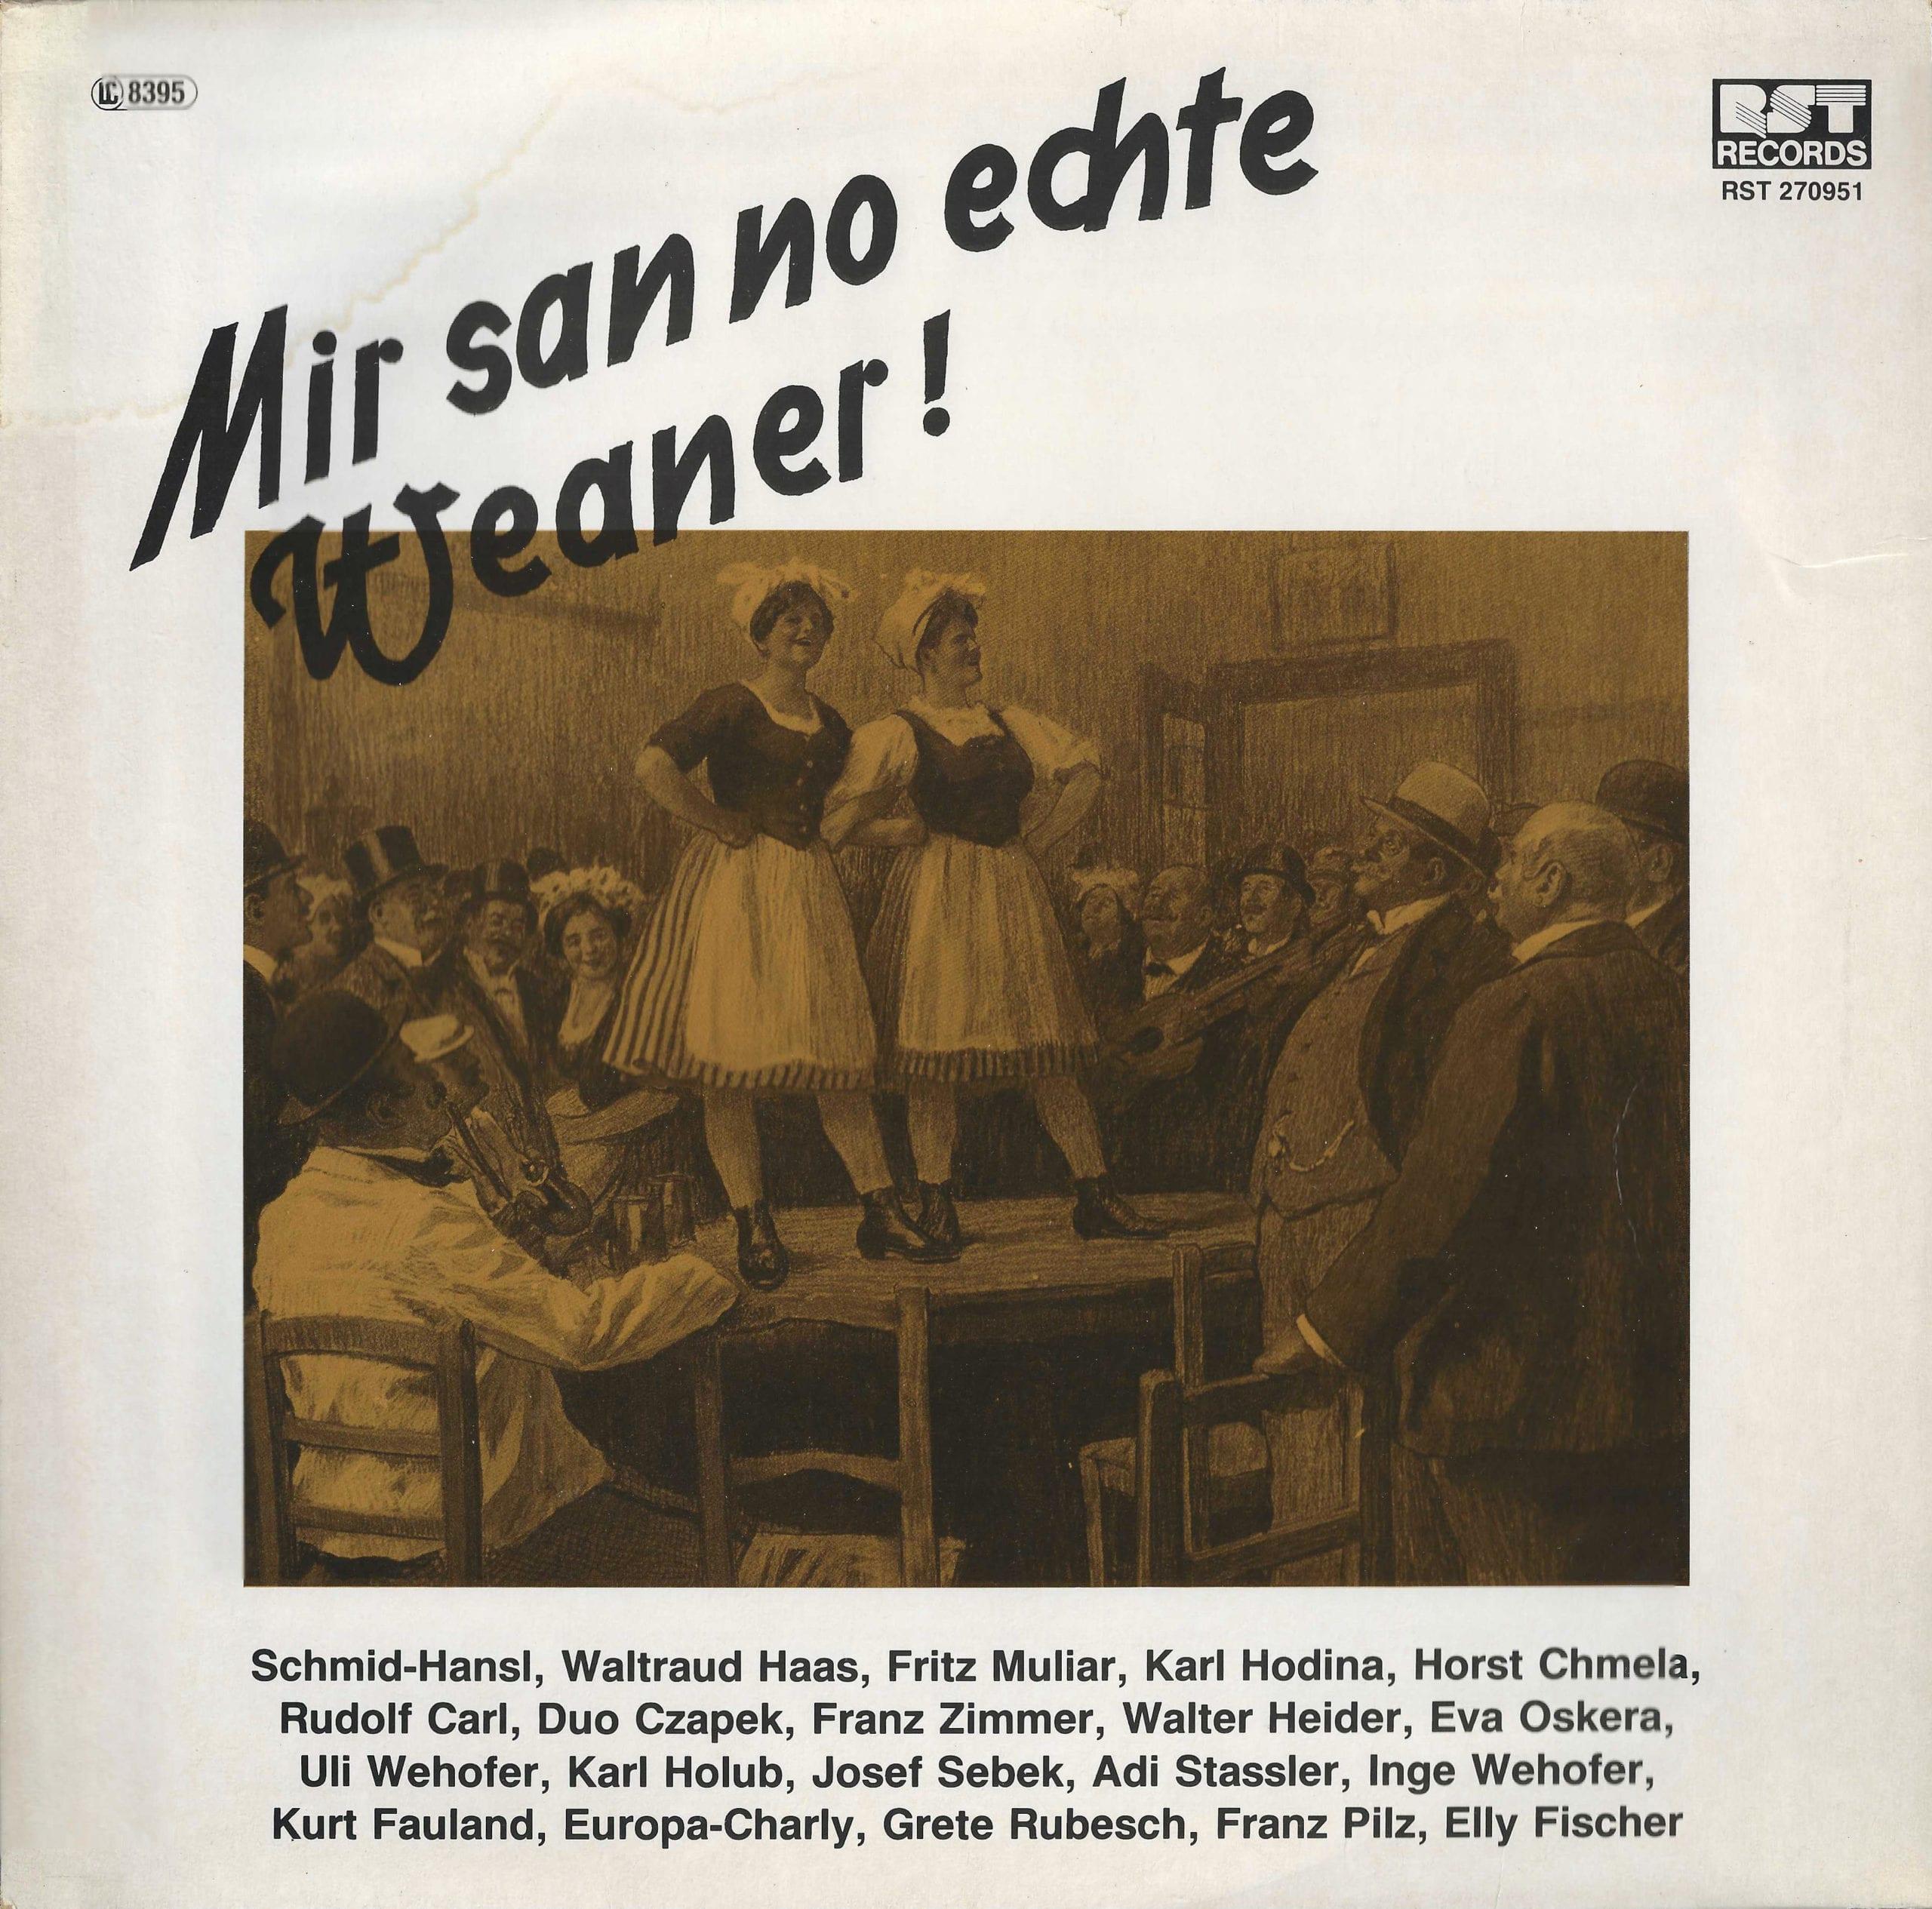 Mir san no echte Weaner – 1